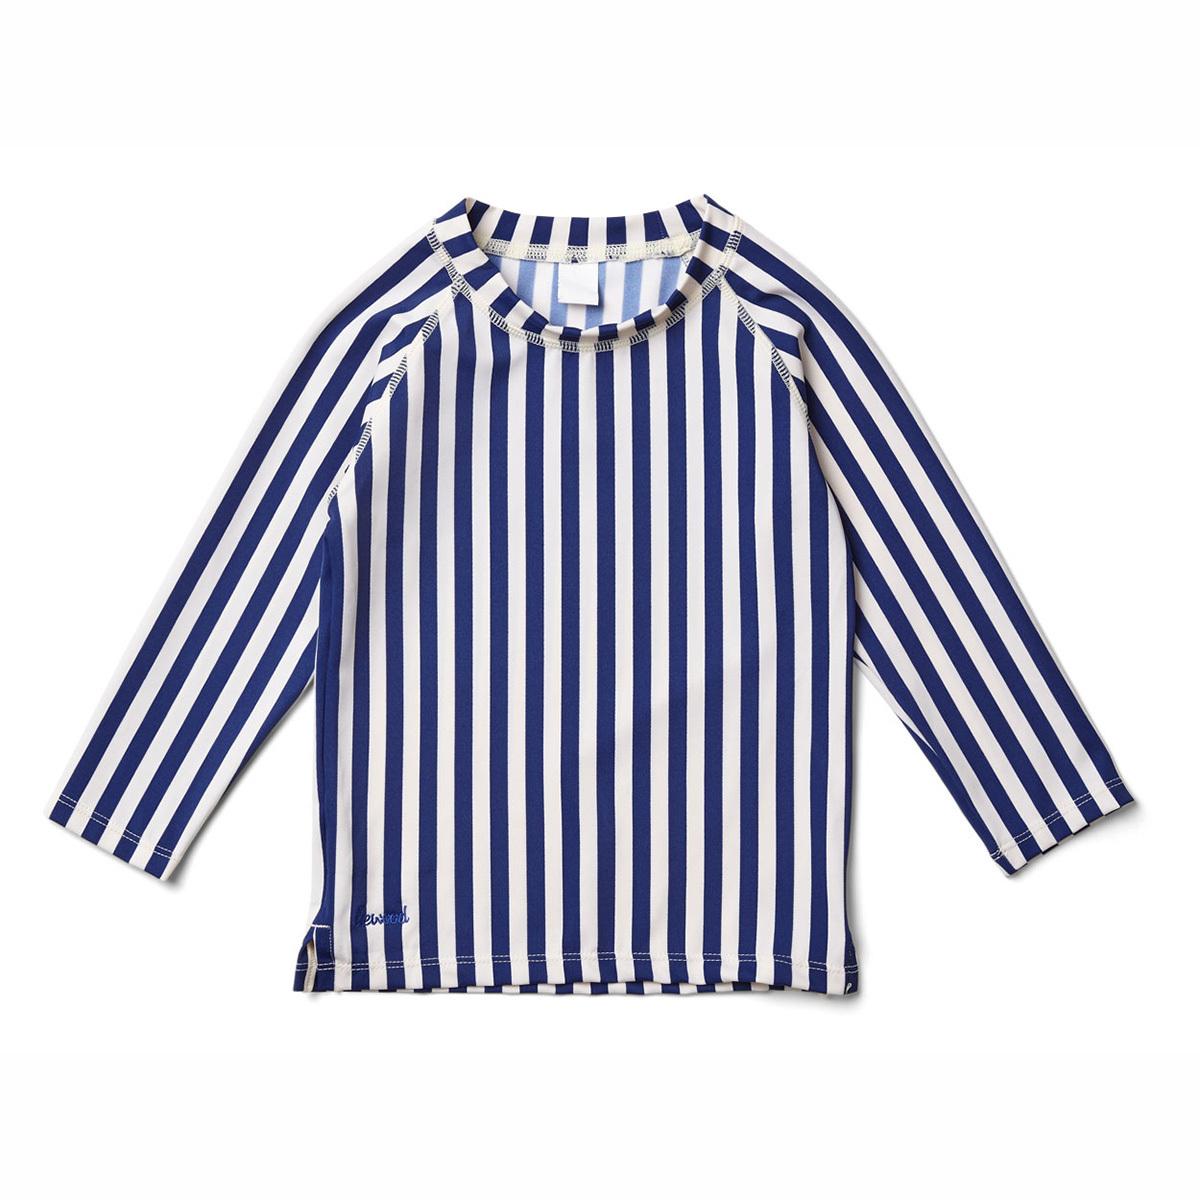 Accessoires bébé T-Shirt Noah - Navy - 2/3 Ans T-Shirt Noah - Navy - 2/3 Ans